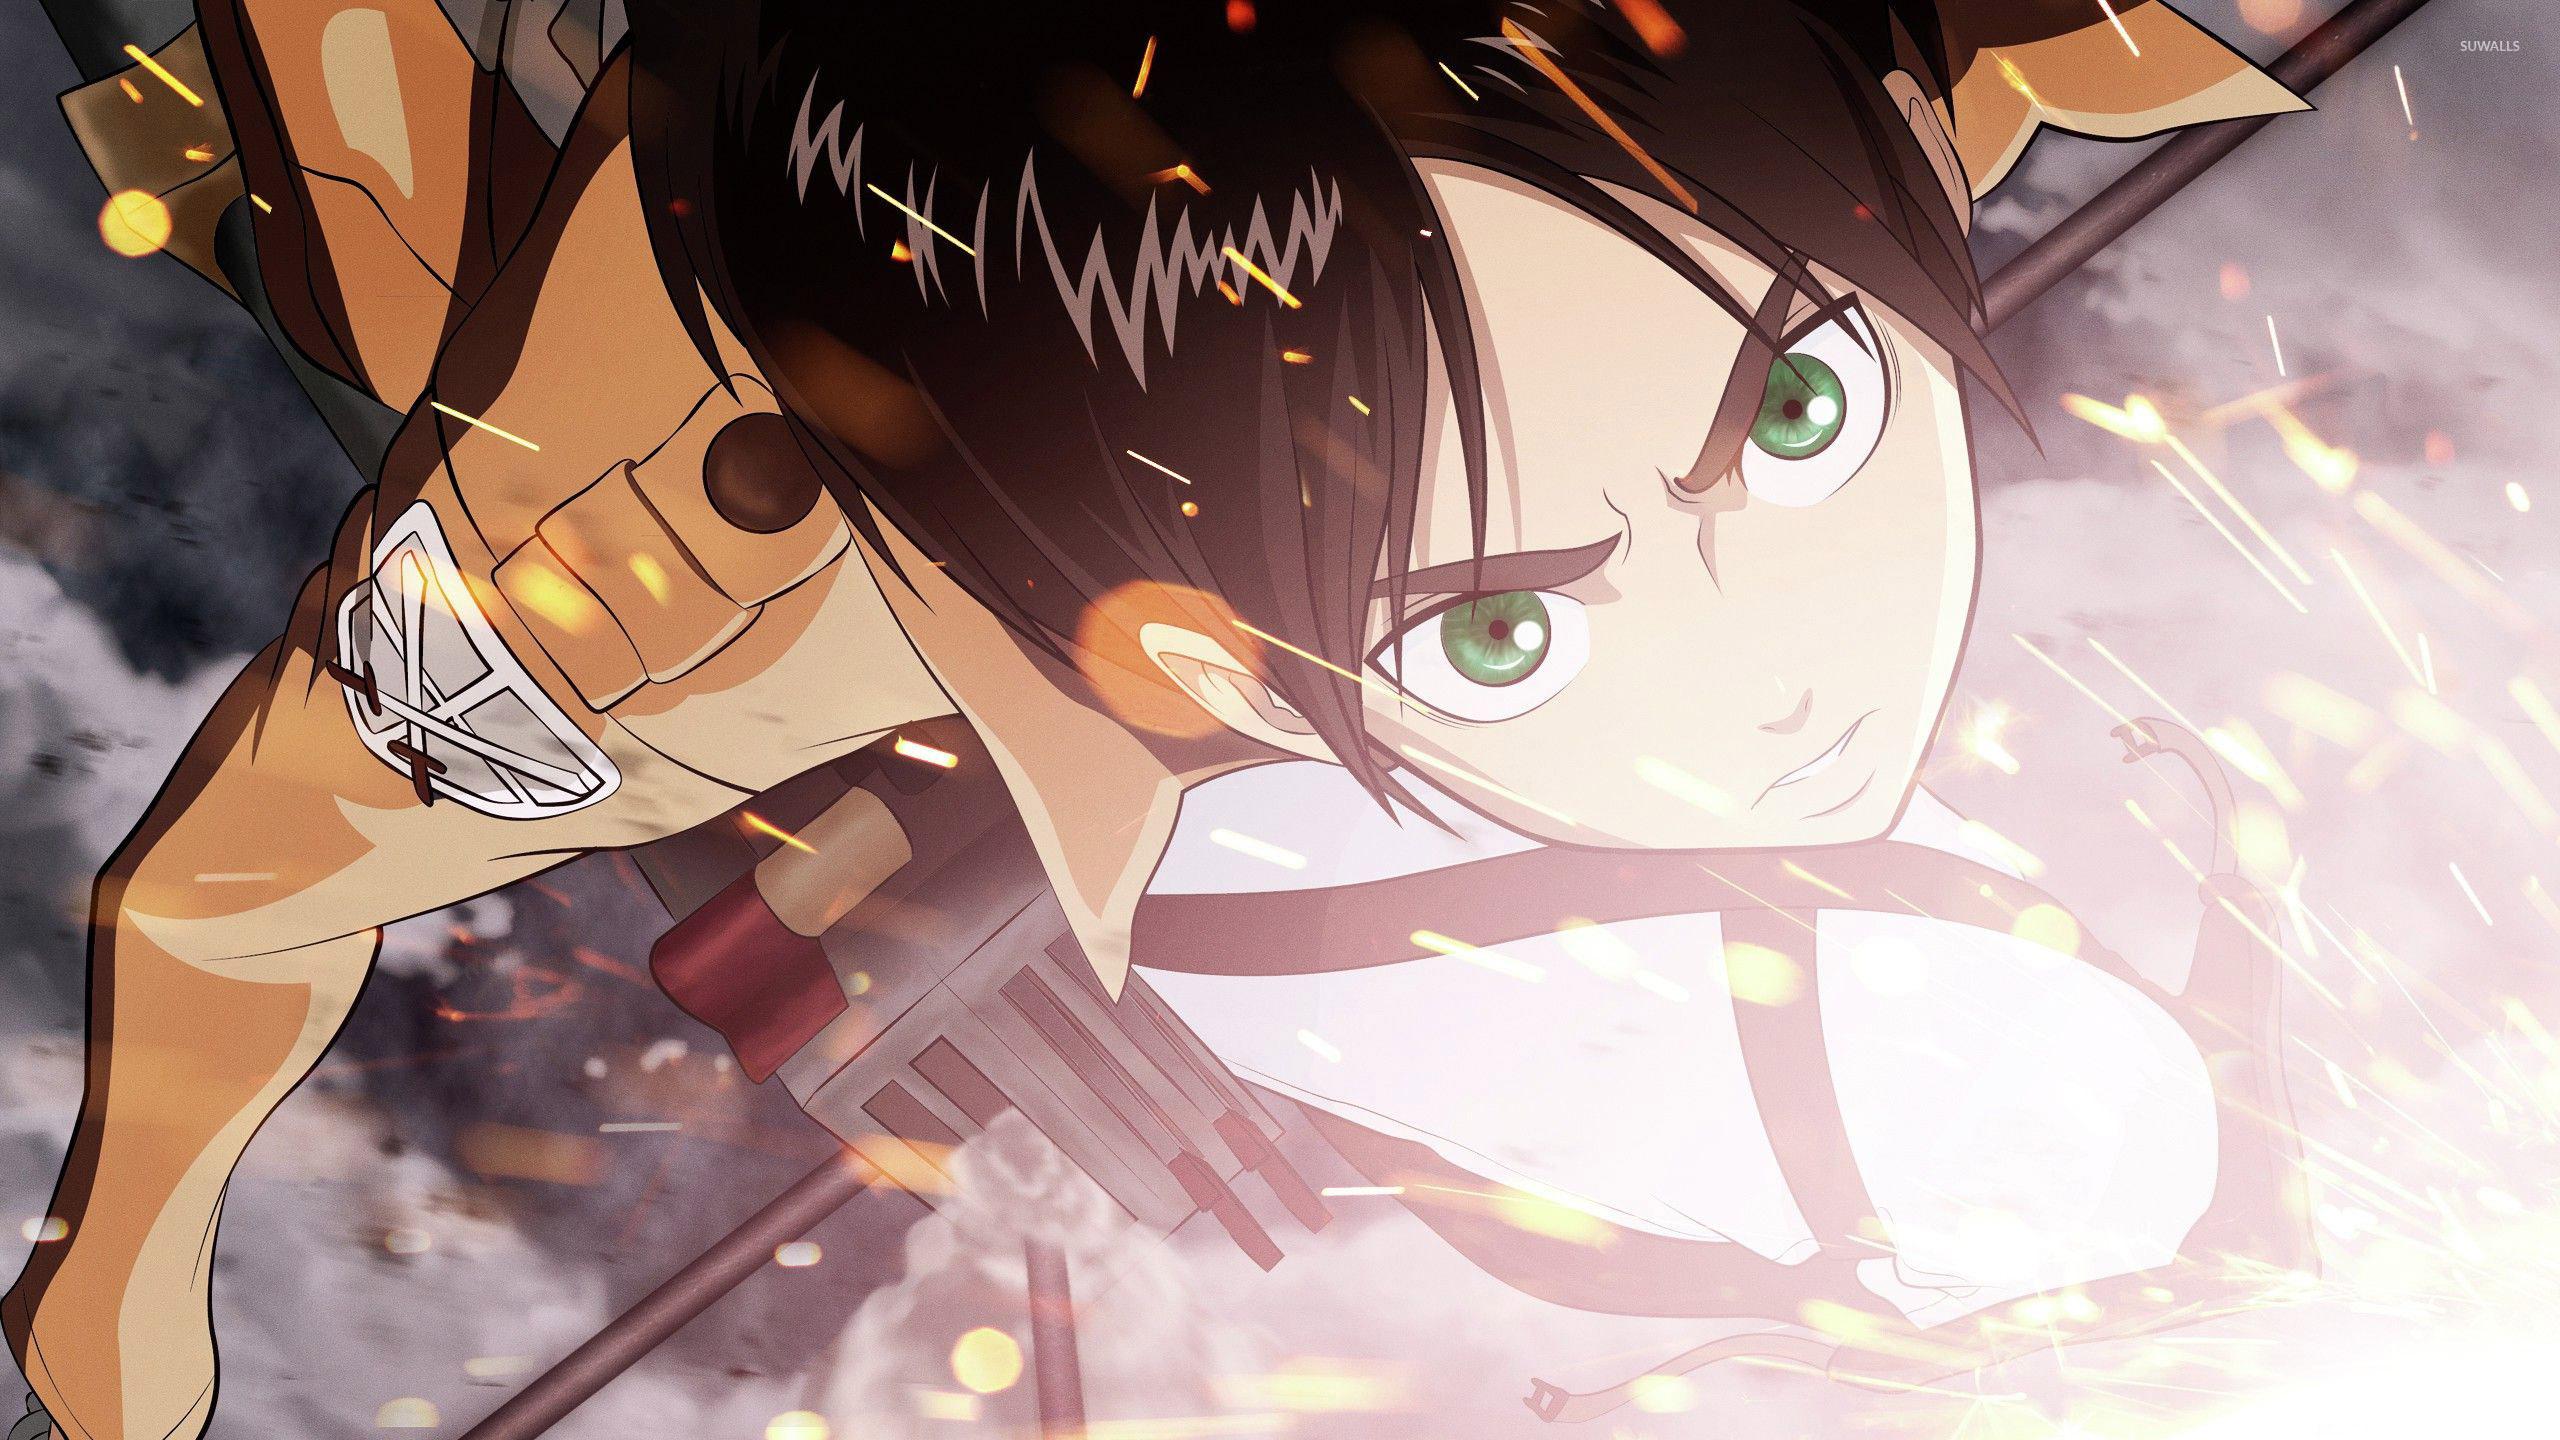 Sasha Blouse Attack On Titan 2 Wallpaper Anime Wallpapers 28332